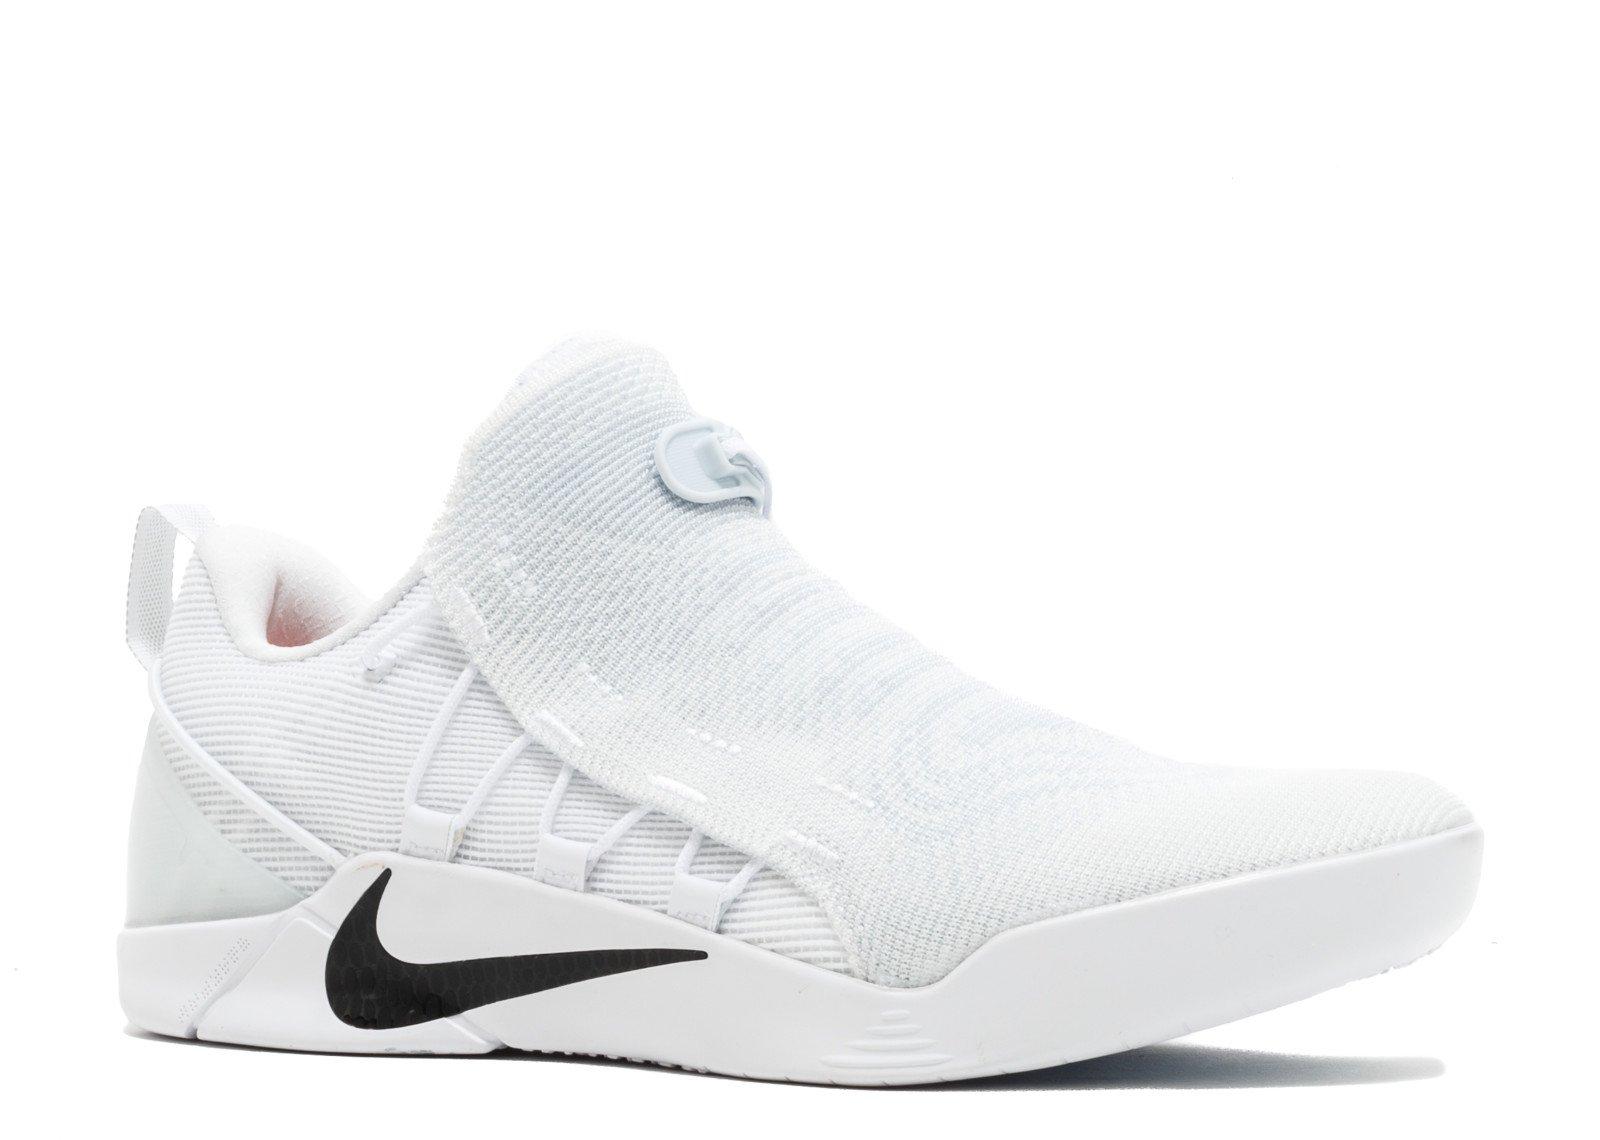 3fda54d08c5 Nike Men's Kobe A.D. NXT, White/Black, 9 M US